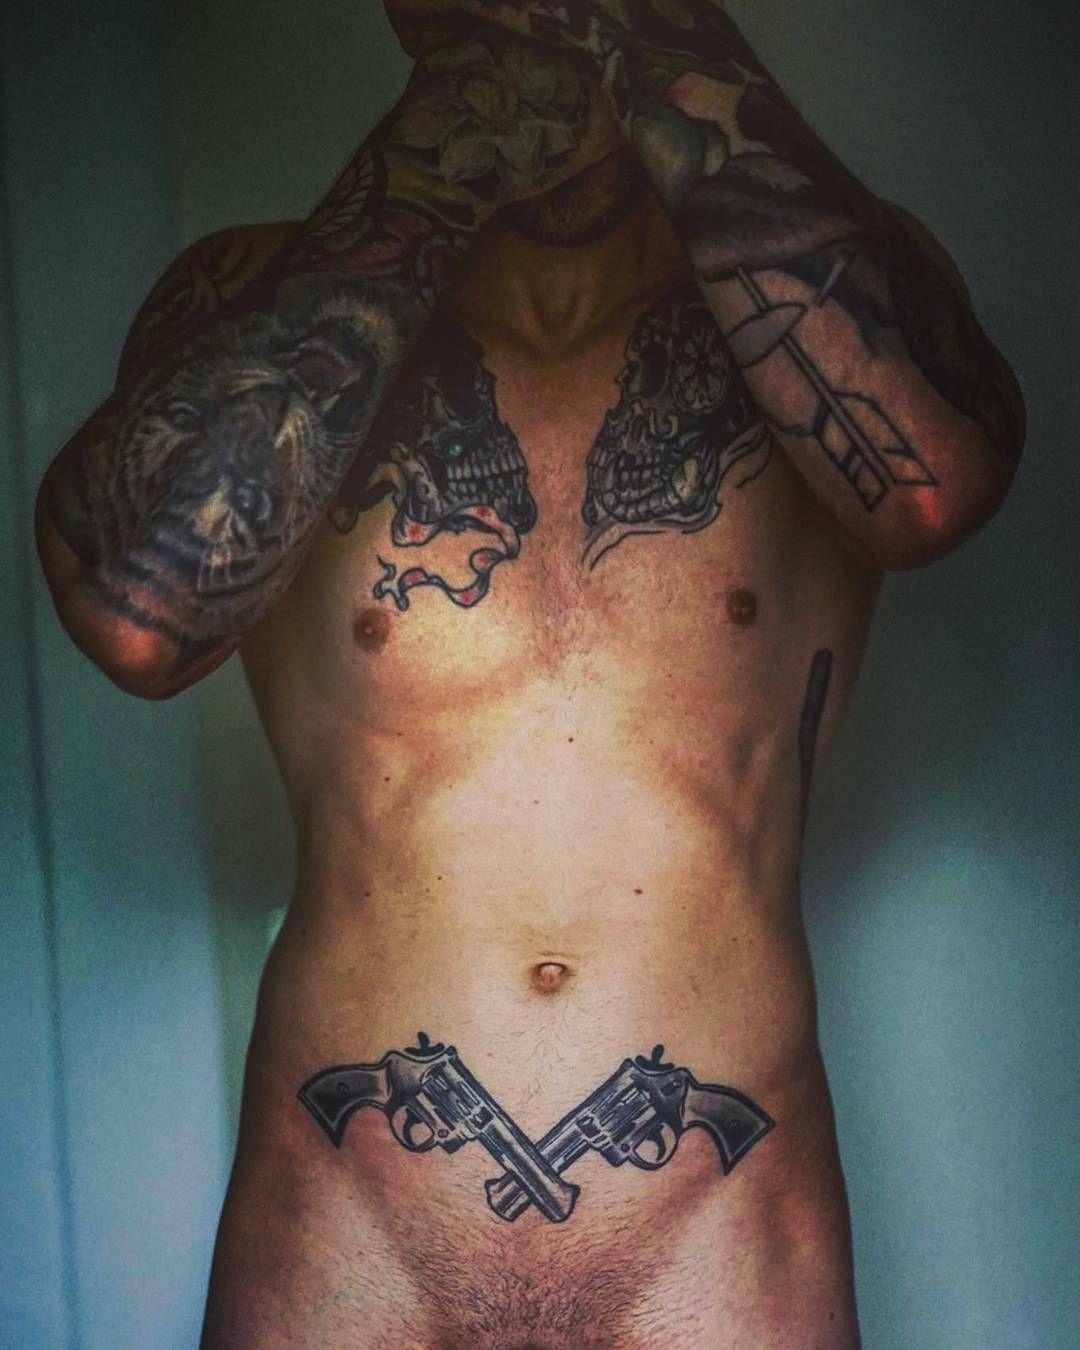 637f858989bca #ink #inked #bad #tattoo #tattoos #tattooed #gun #beast #handsome #gorgeous  #picoftheday #photooftheday #muscle #fit #beard #bearded #man #boy #girl # girls ...